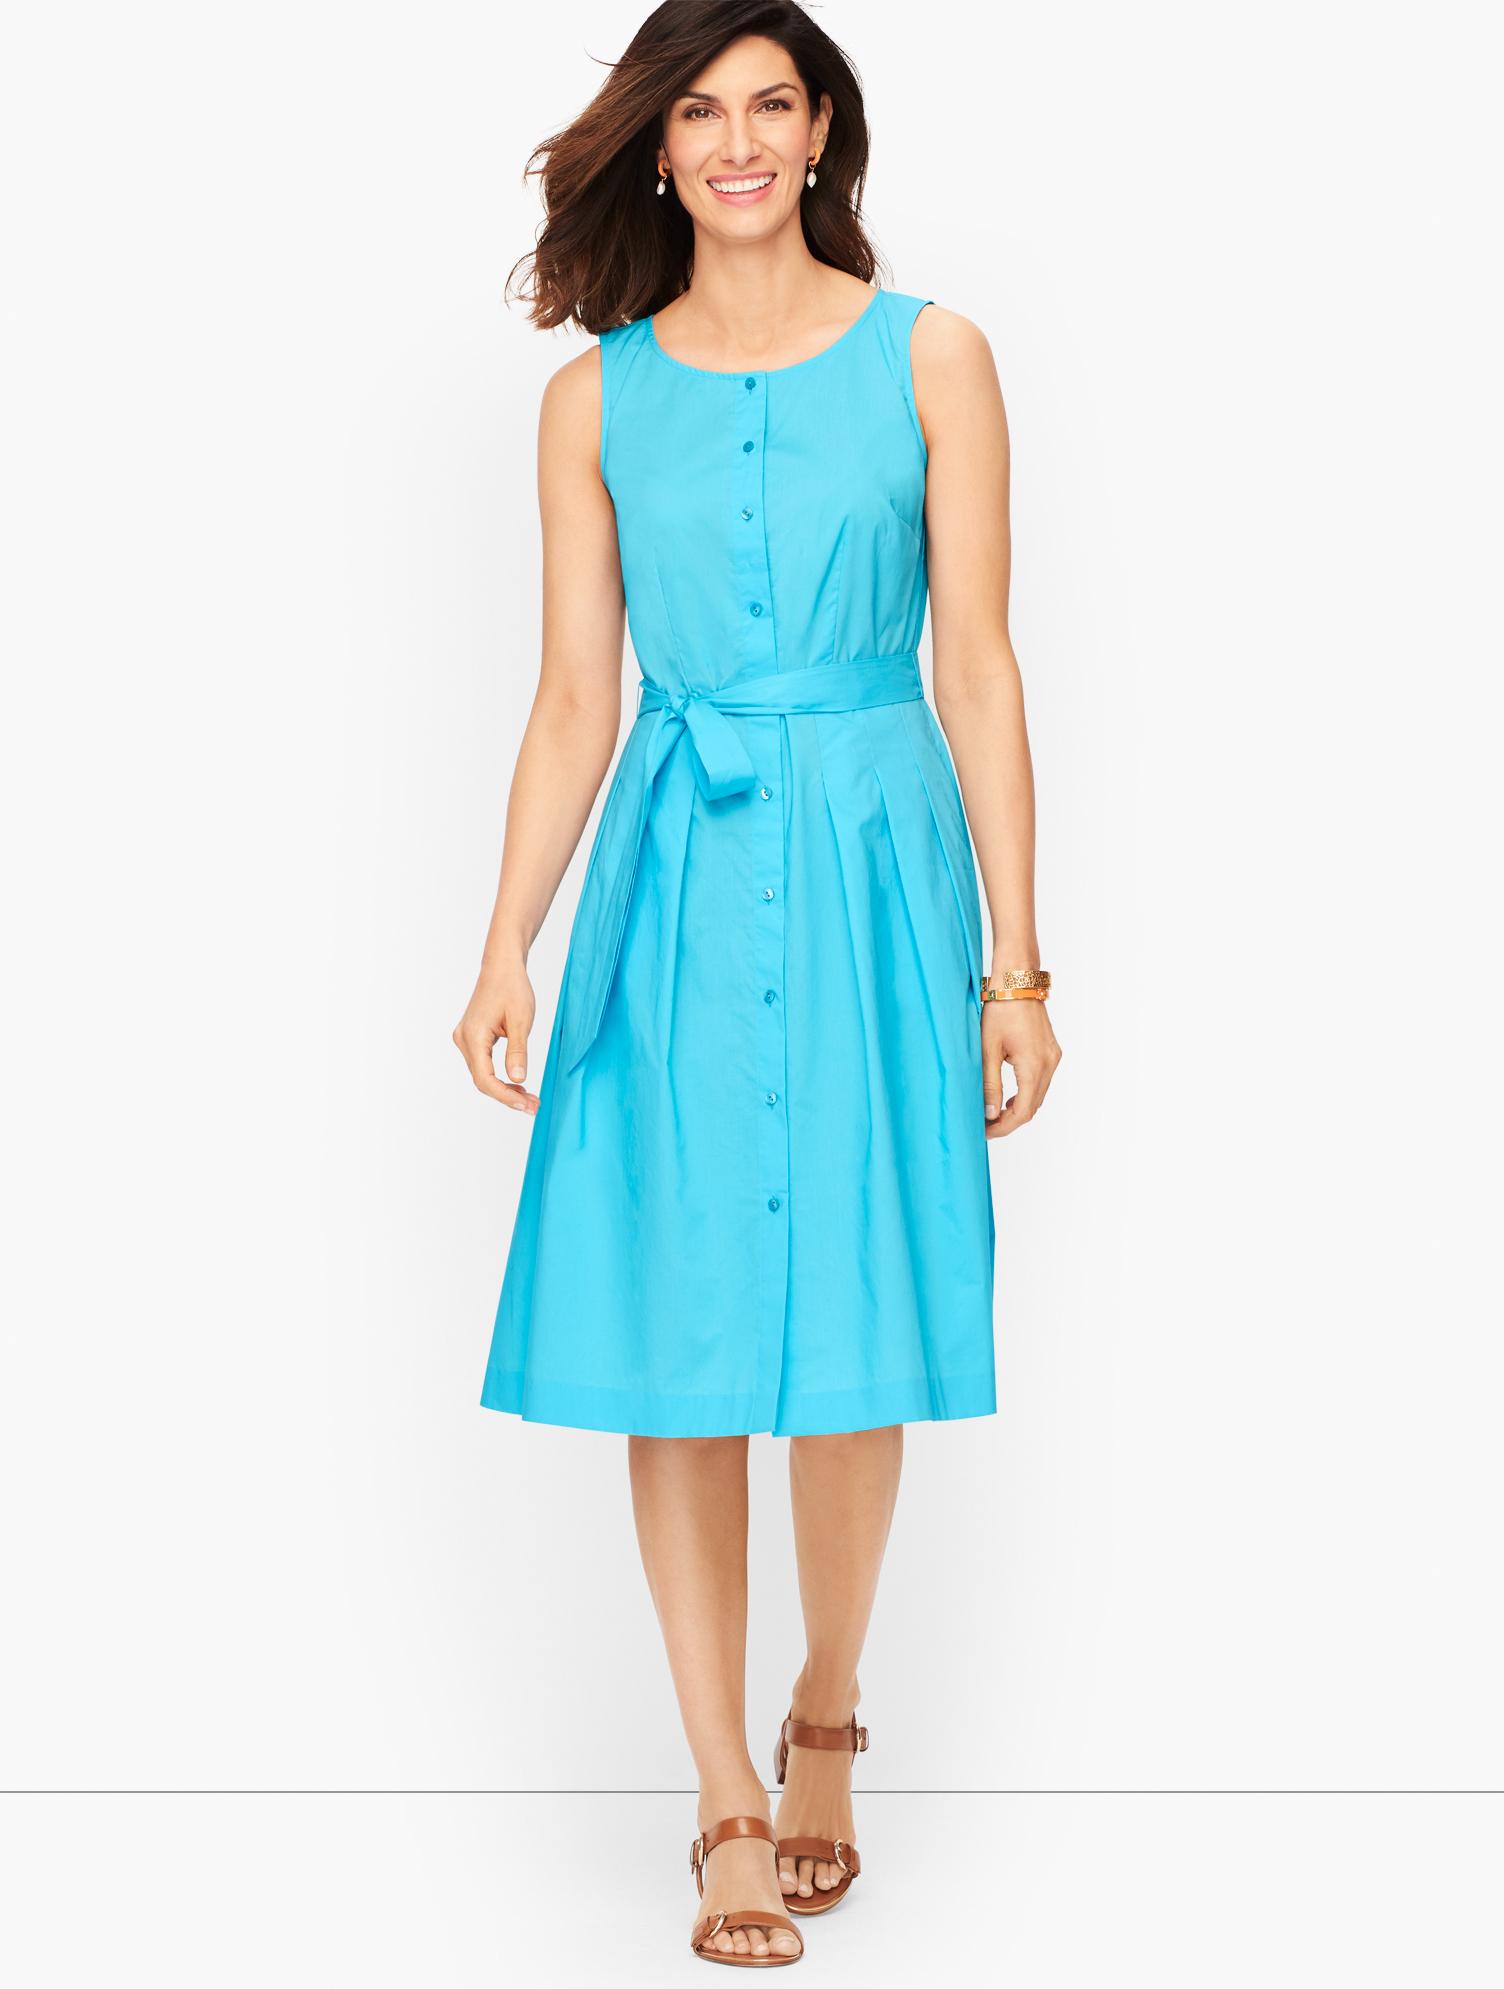 What Did Women Wear in the 1950s? 1950s Fashion Guide Silky Simple Poplin Fit  Flare Dress - Aqua Splash - 24 - 100 Cotton Talbots $159.00 AT vintagedancer.com